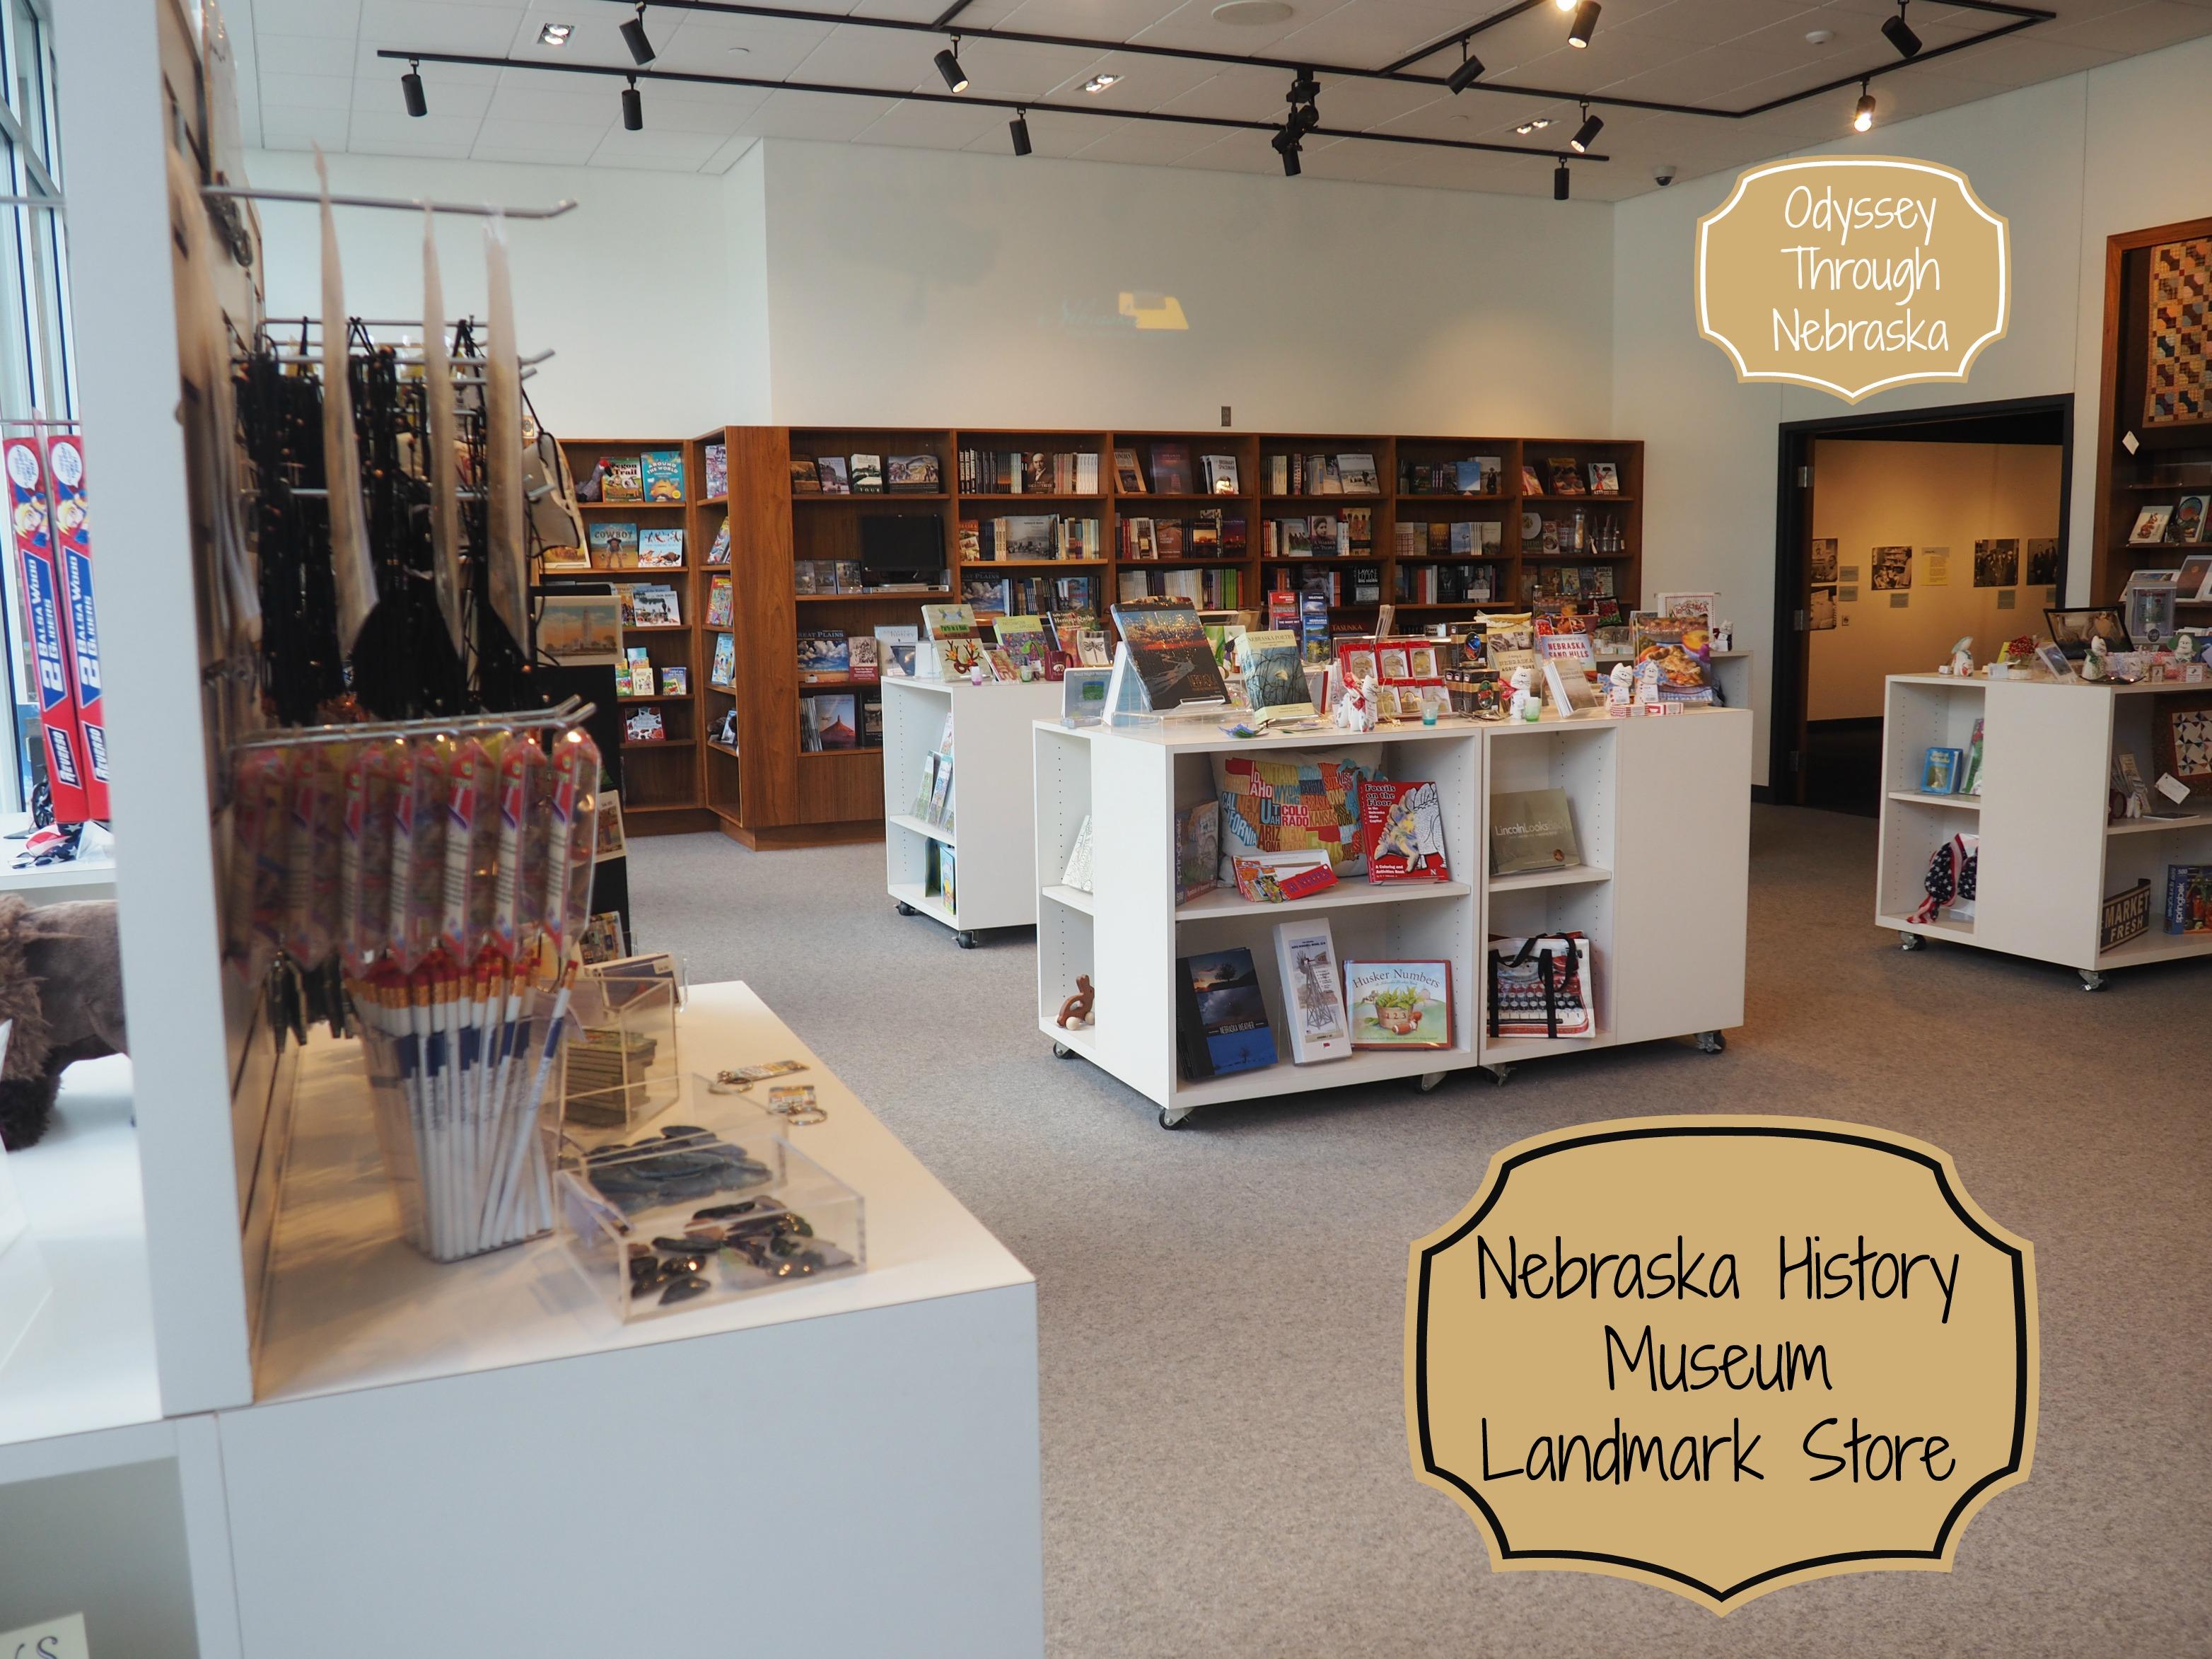 Nebraska History Museum Landmark Store for Nebraska Items Feature Image